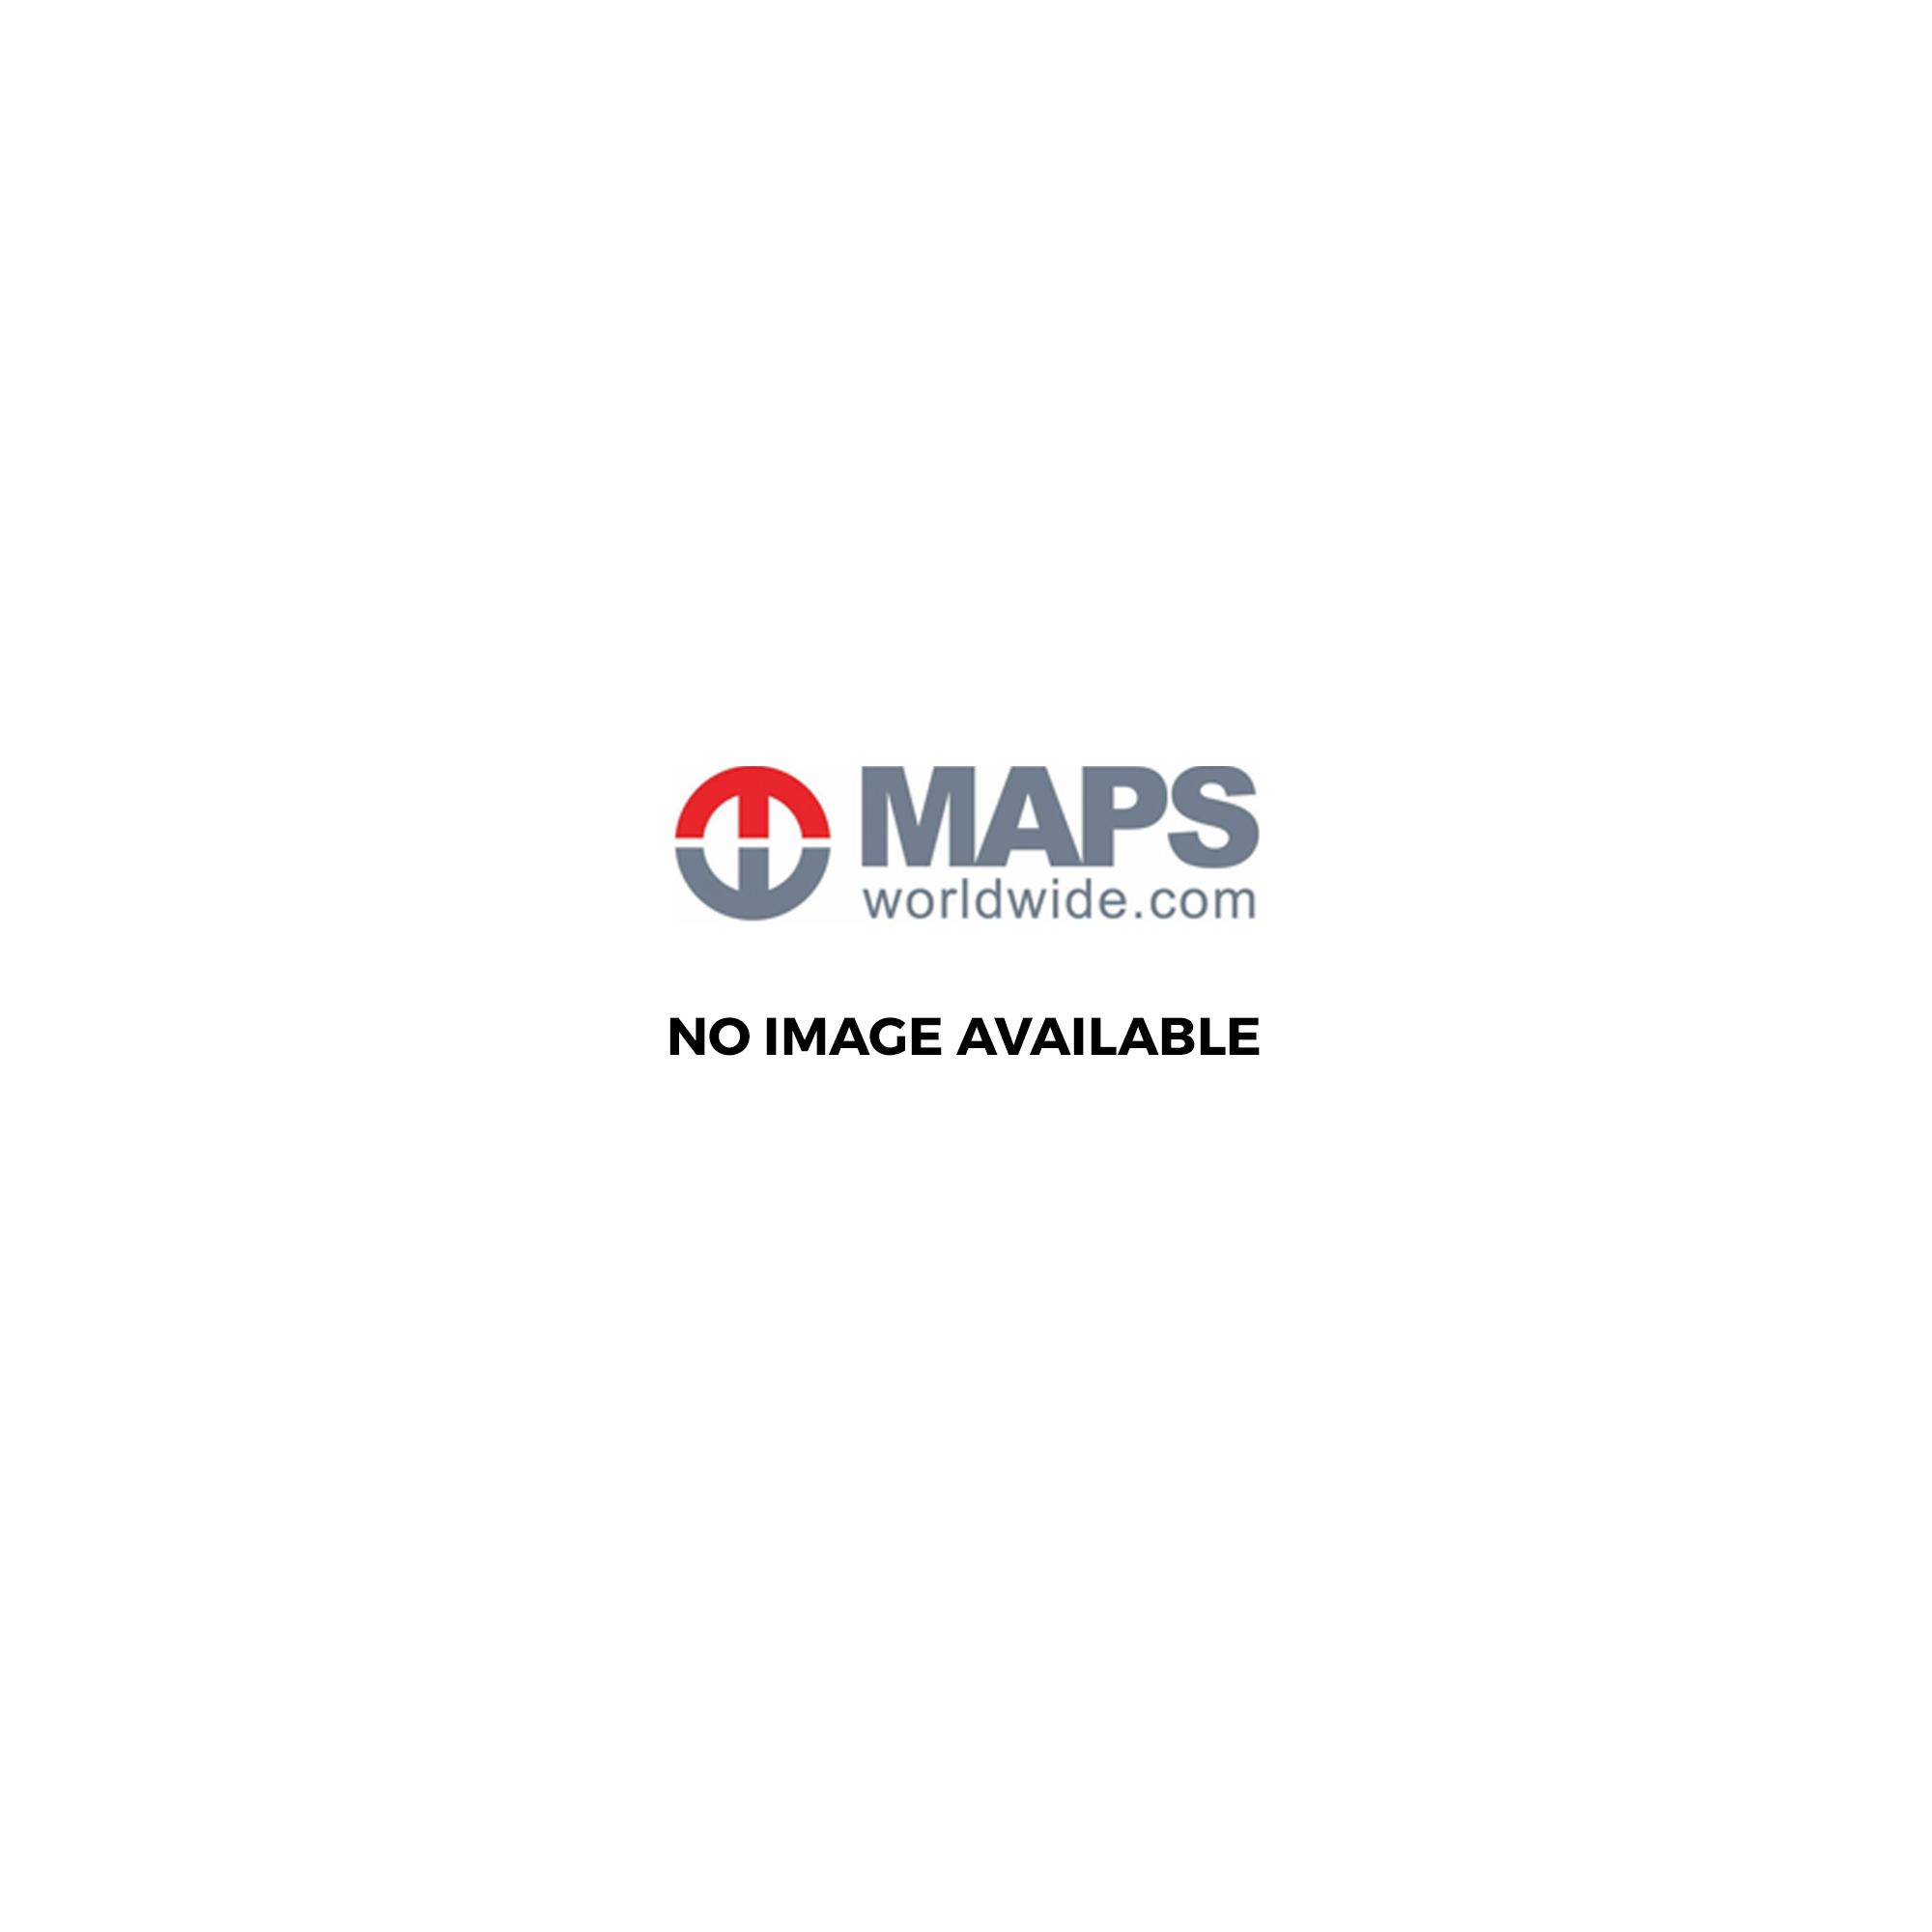 72515 - Clermont Ferrand Street map on council of clermont map, munich map, saumur map, newcastle upon tyne map, le havre map, utrecht map, carcassonne map, london map, trieste map, cluj-napoca map, mont saint-michel map, boulogne-sur-mer map, seine map, rennes map, cahors map, vila nova de gaia map, turku map, arras map, evian-les-bains map, strasbourg map,